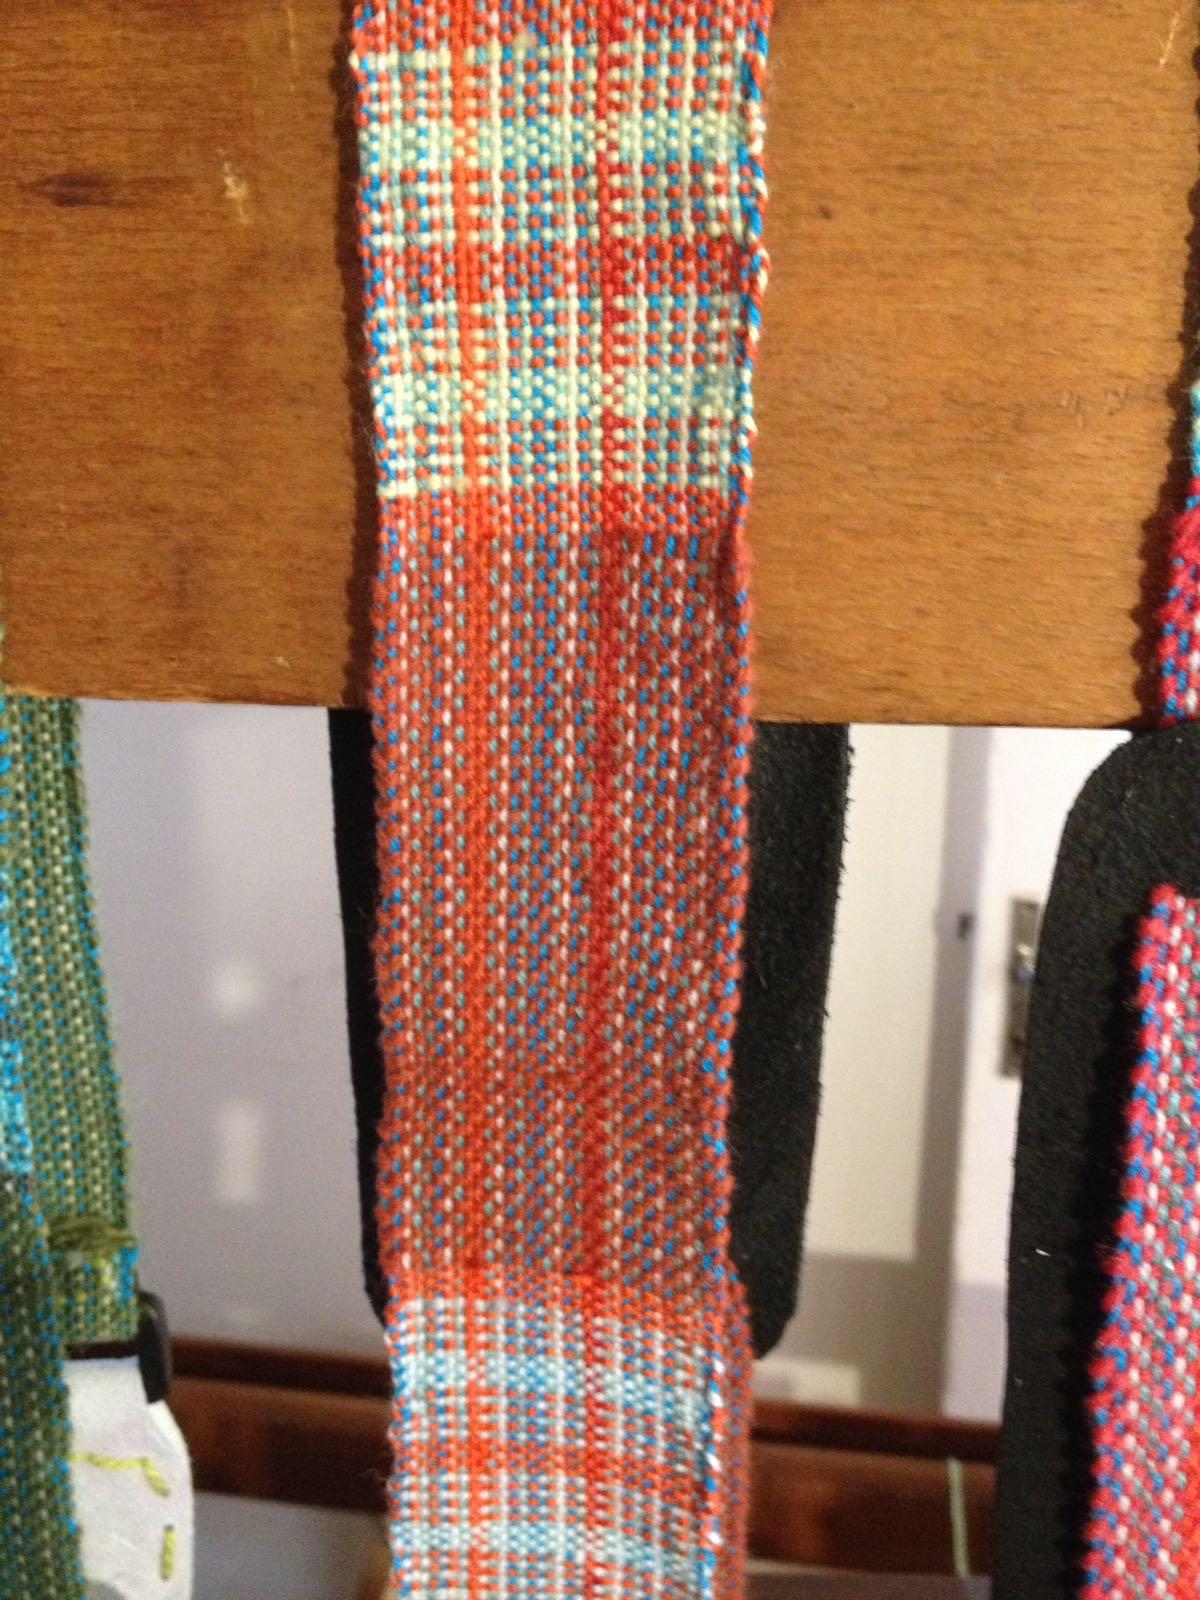 Detail of brown strap